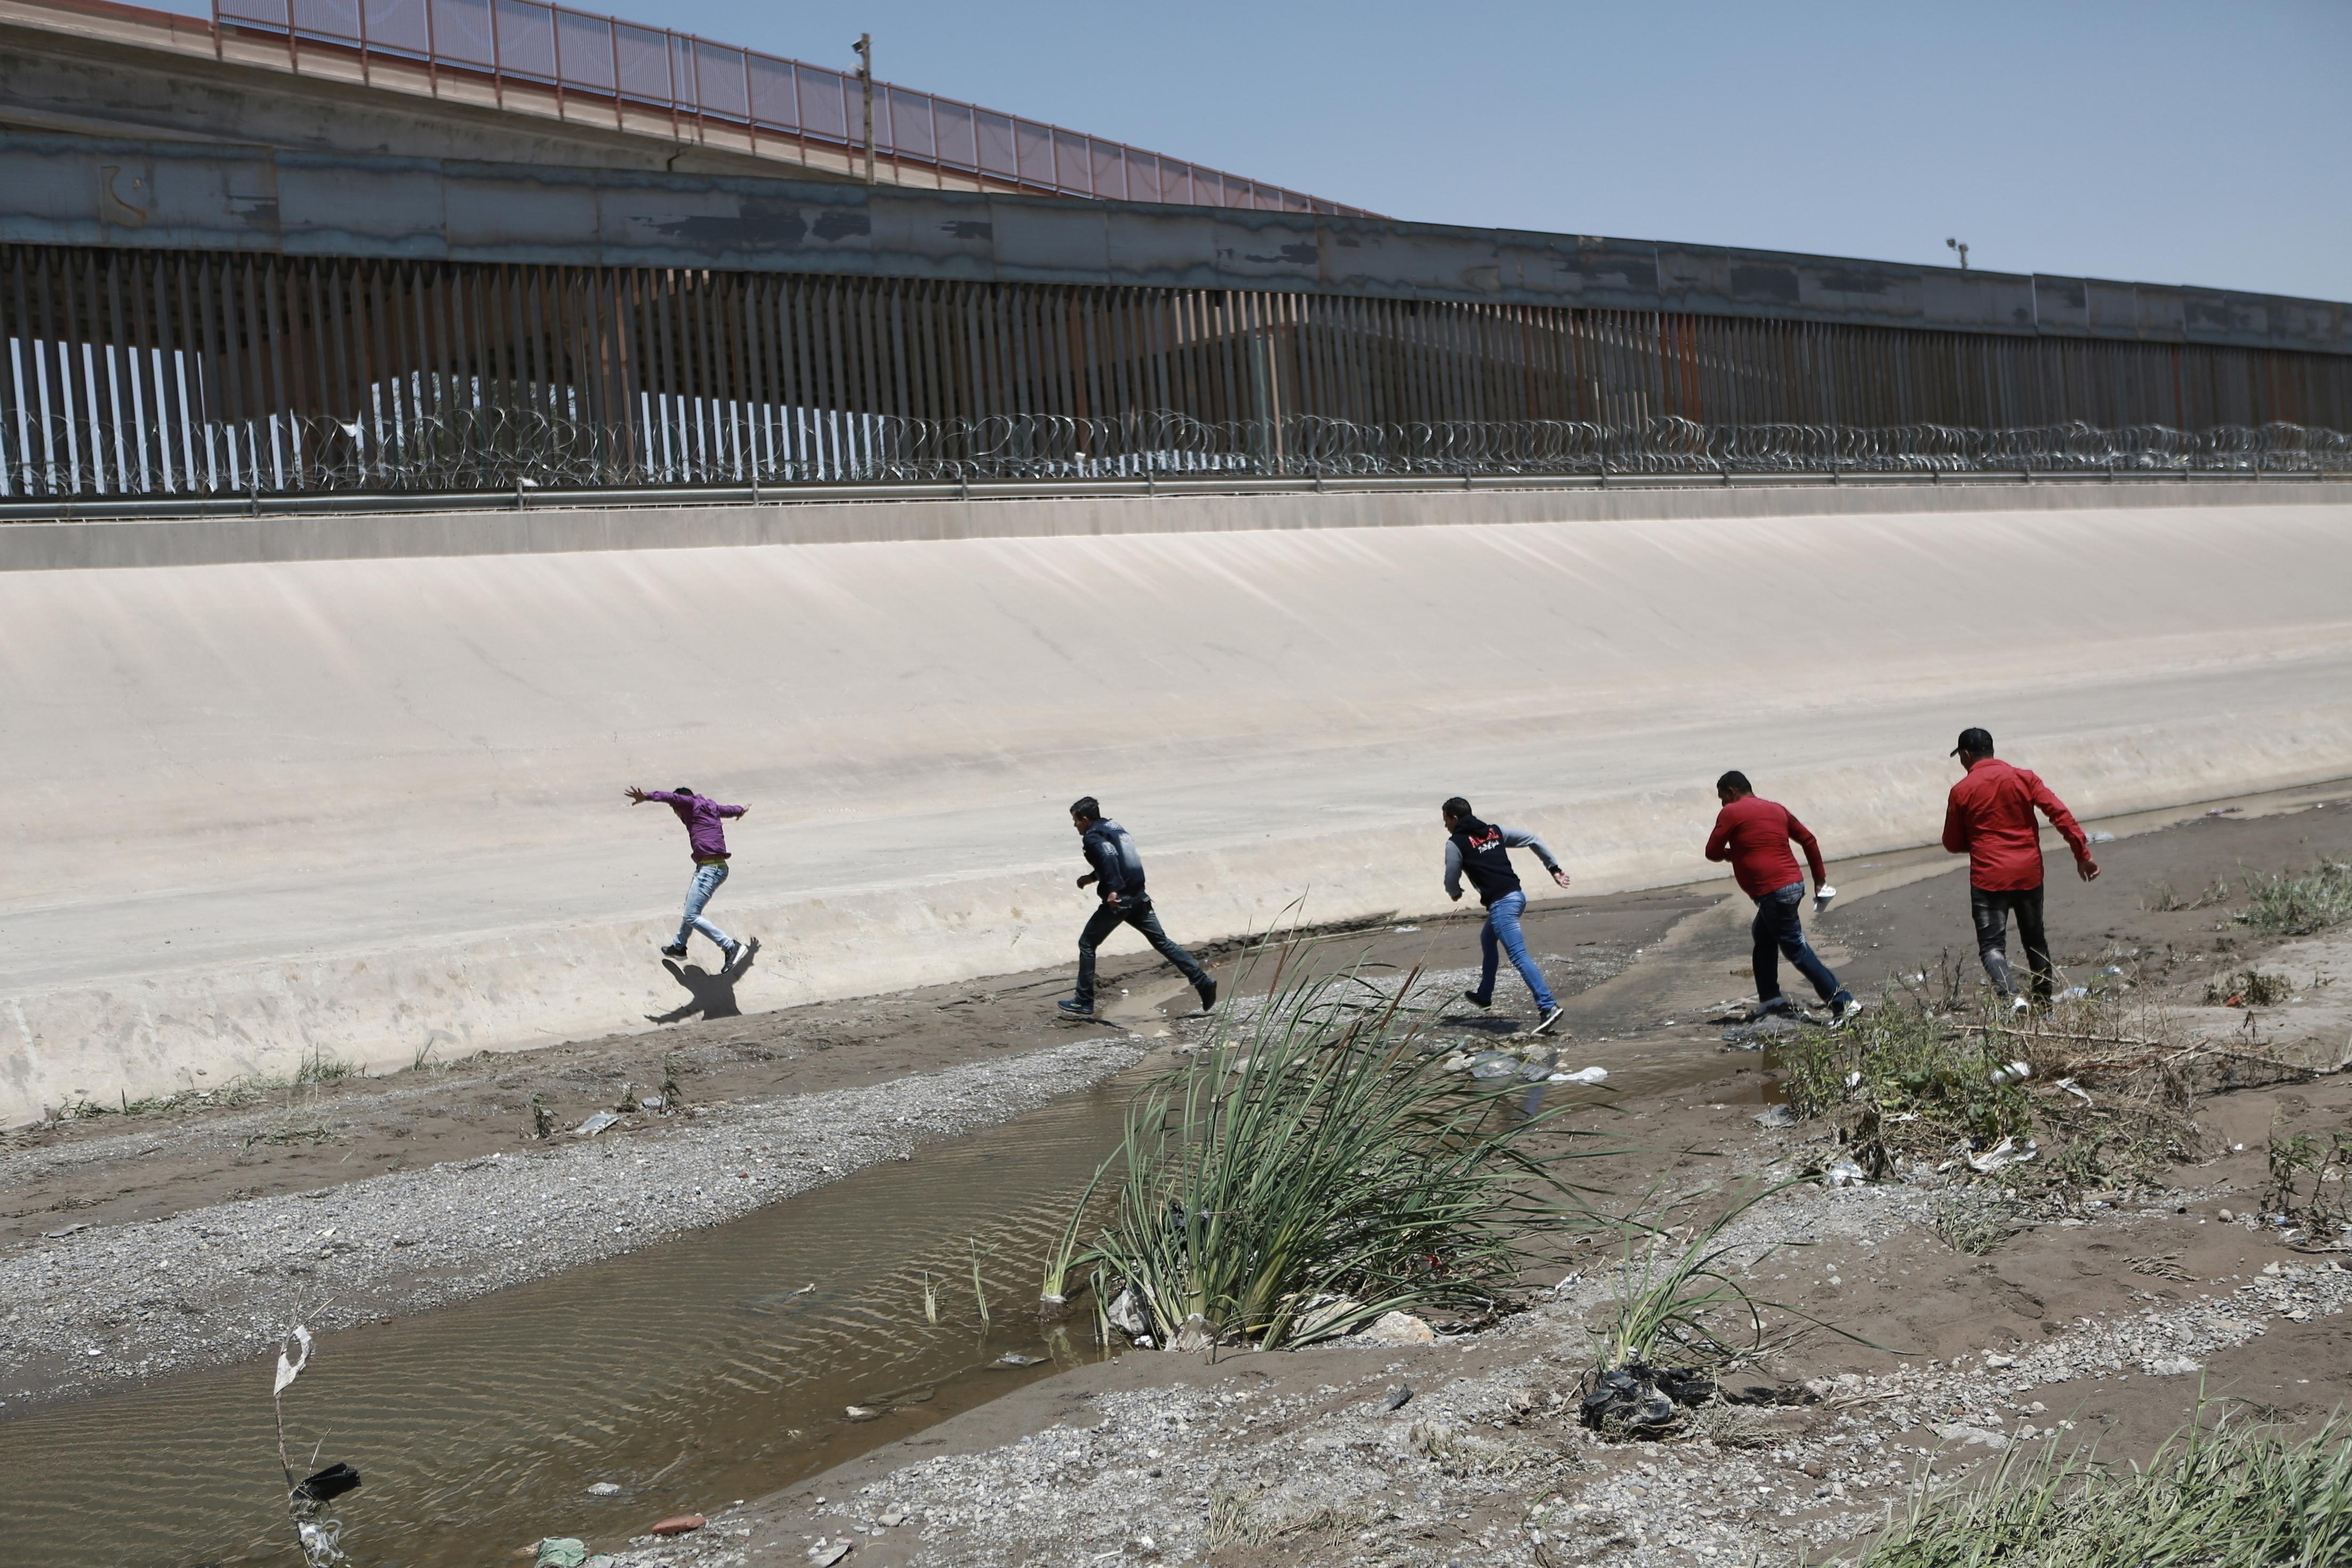 Before massacre, El Paso became a hot spot on Mexican border